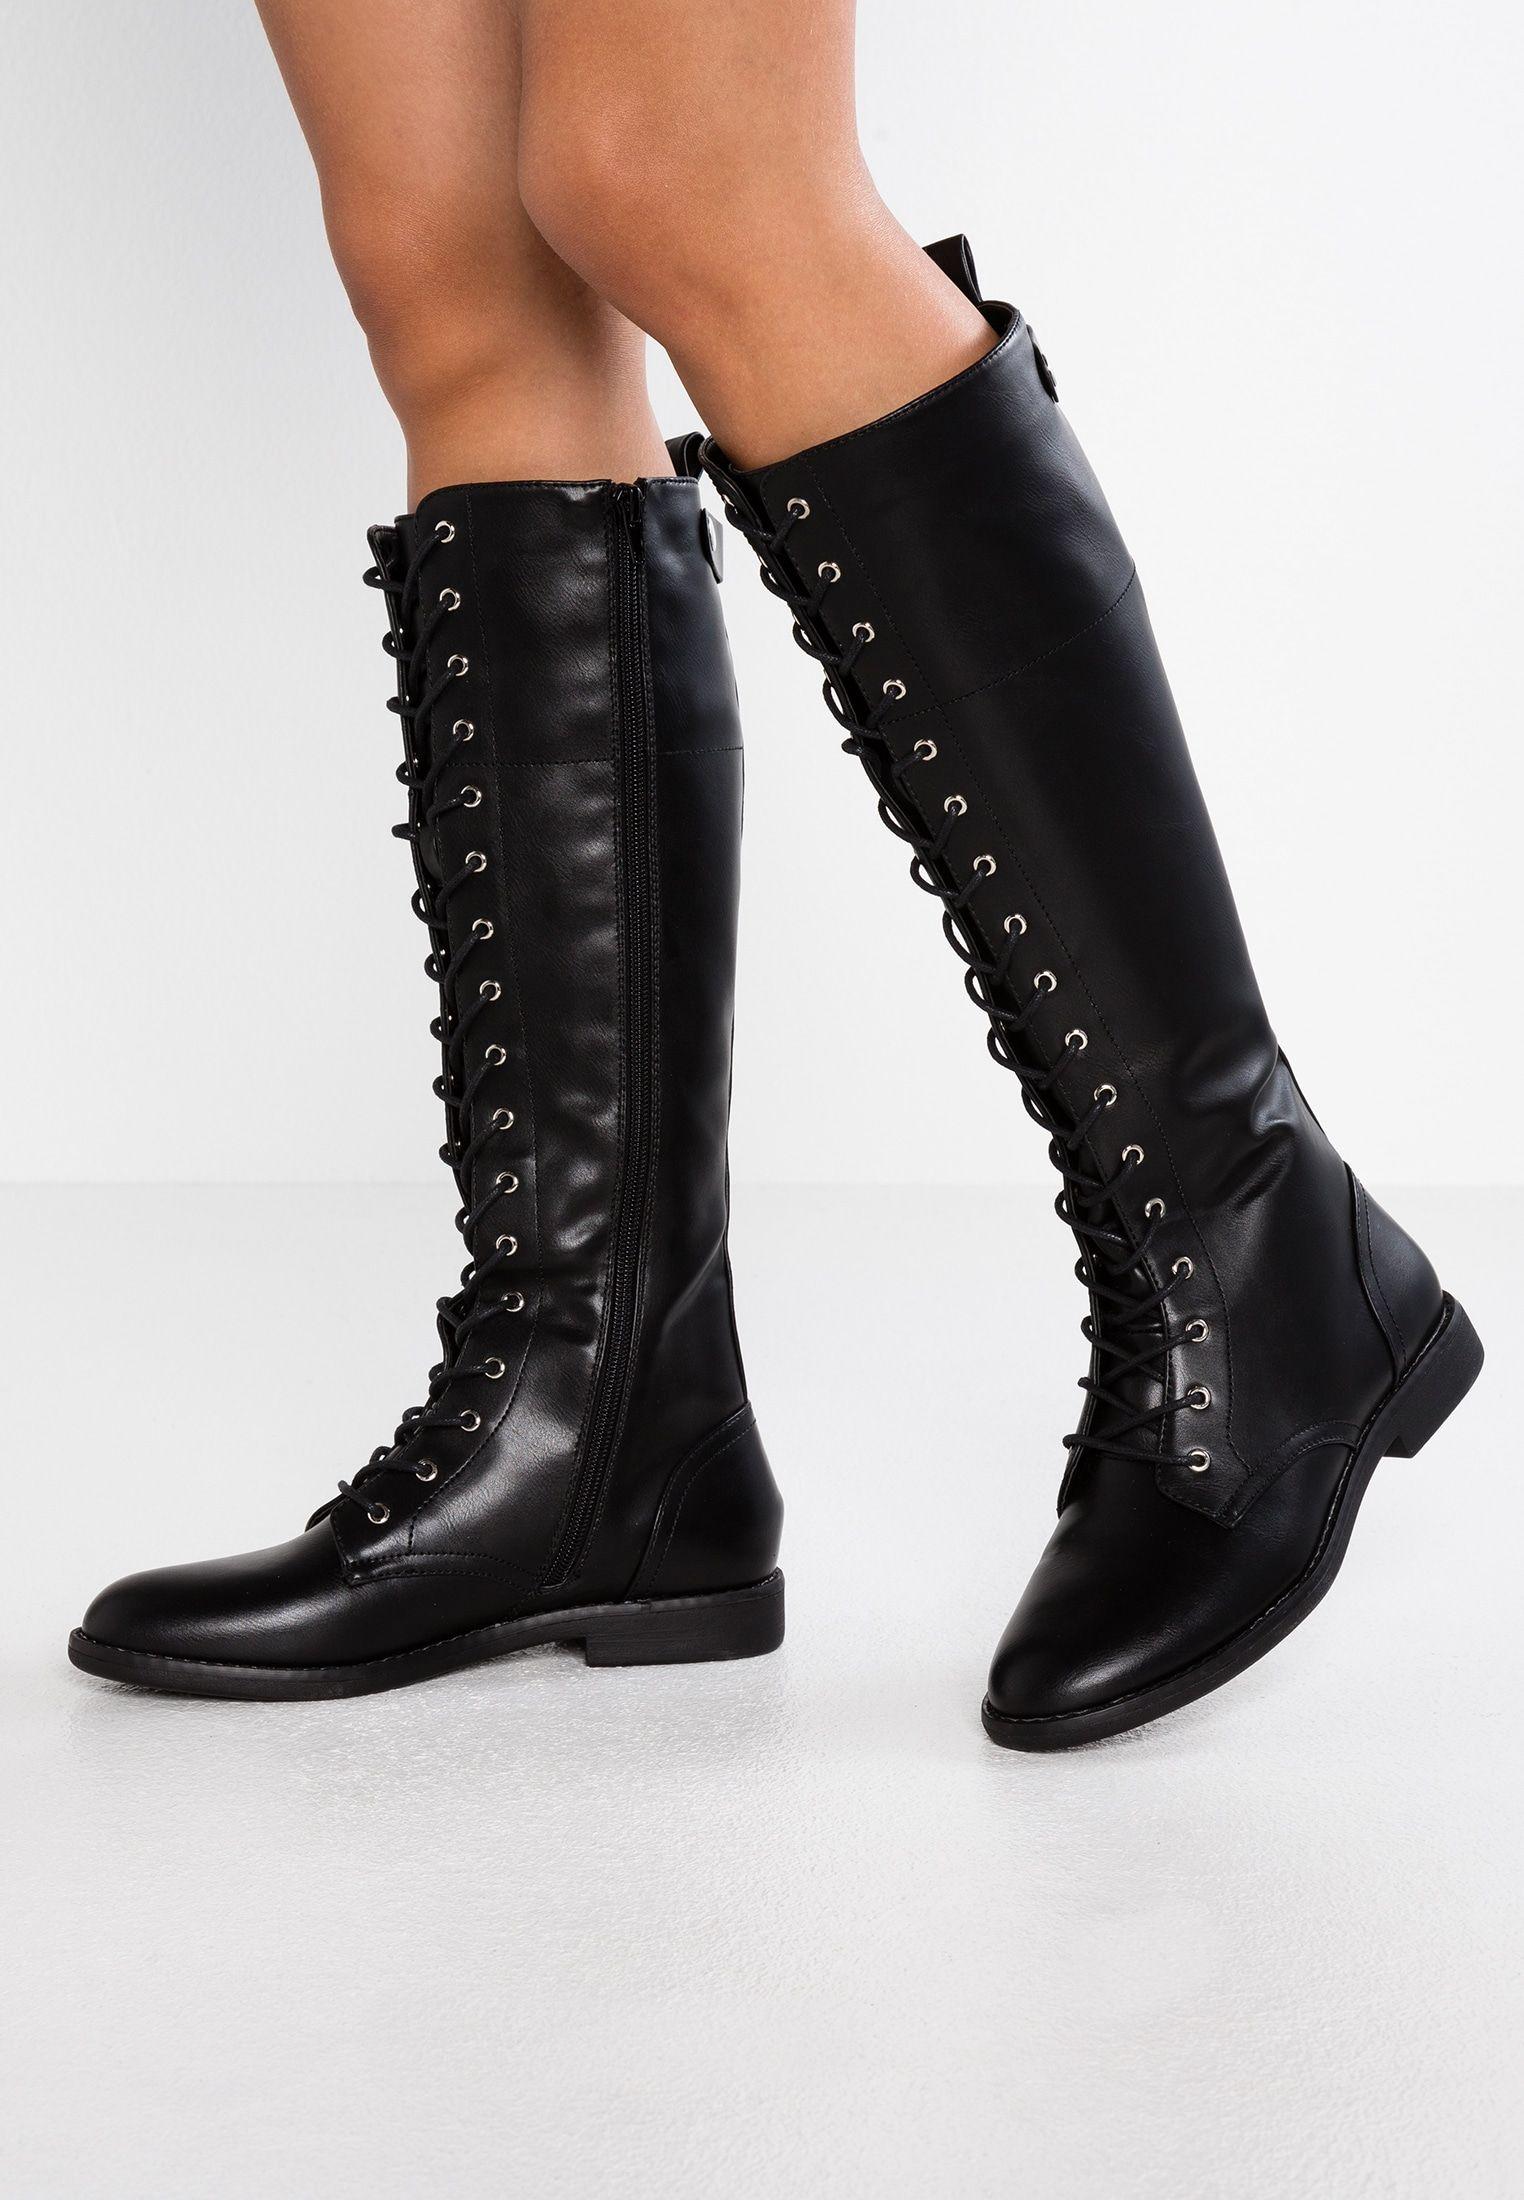 Anna Field Kozaki Sznurowane Black Zalando Pl Black Boots Block Heel Shoes Boots